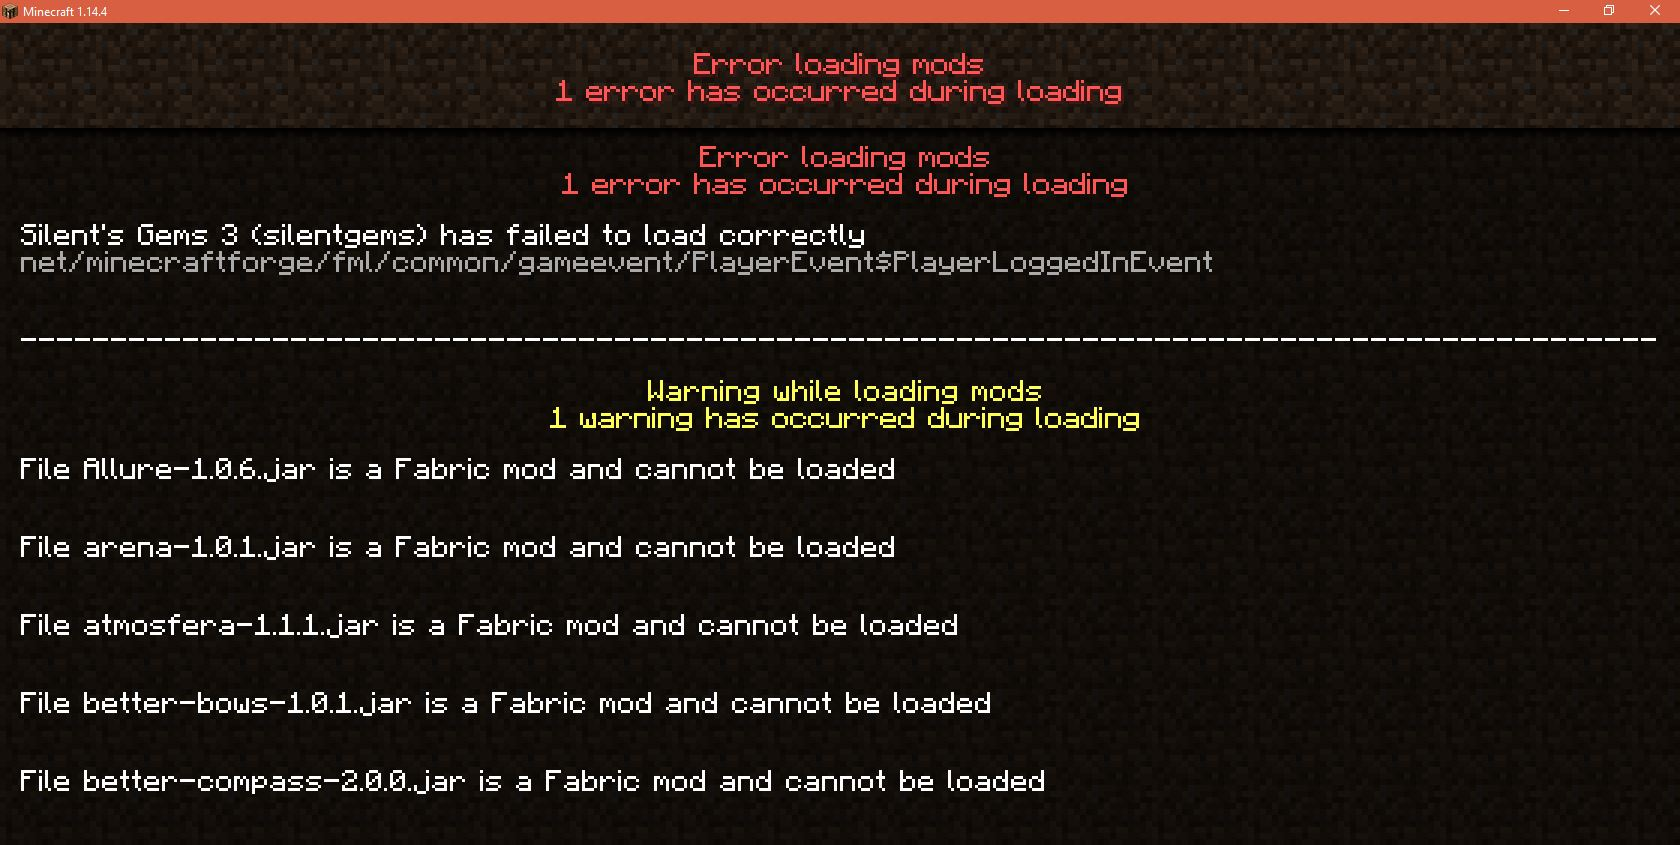 Replay Mod 1 14 4 Mods Discussion Minecraft Mods Mapping And Modding Java Edition Minecraft Forum Minecraft Forum